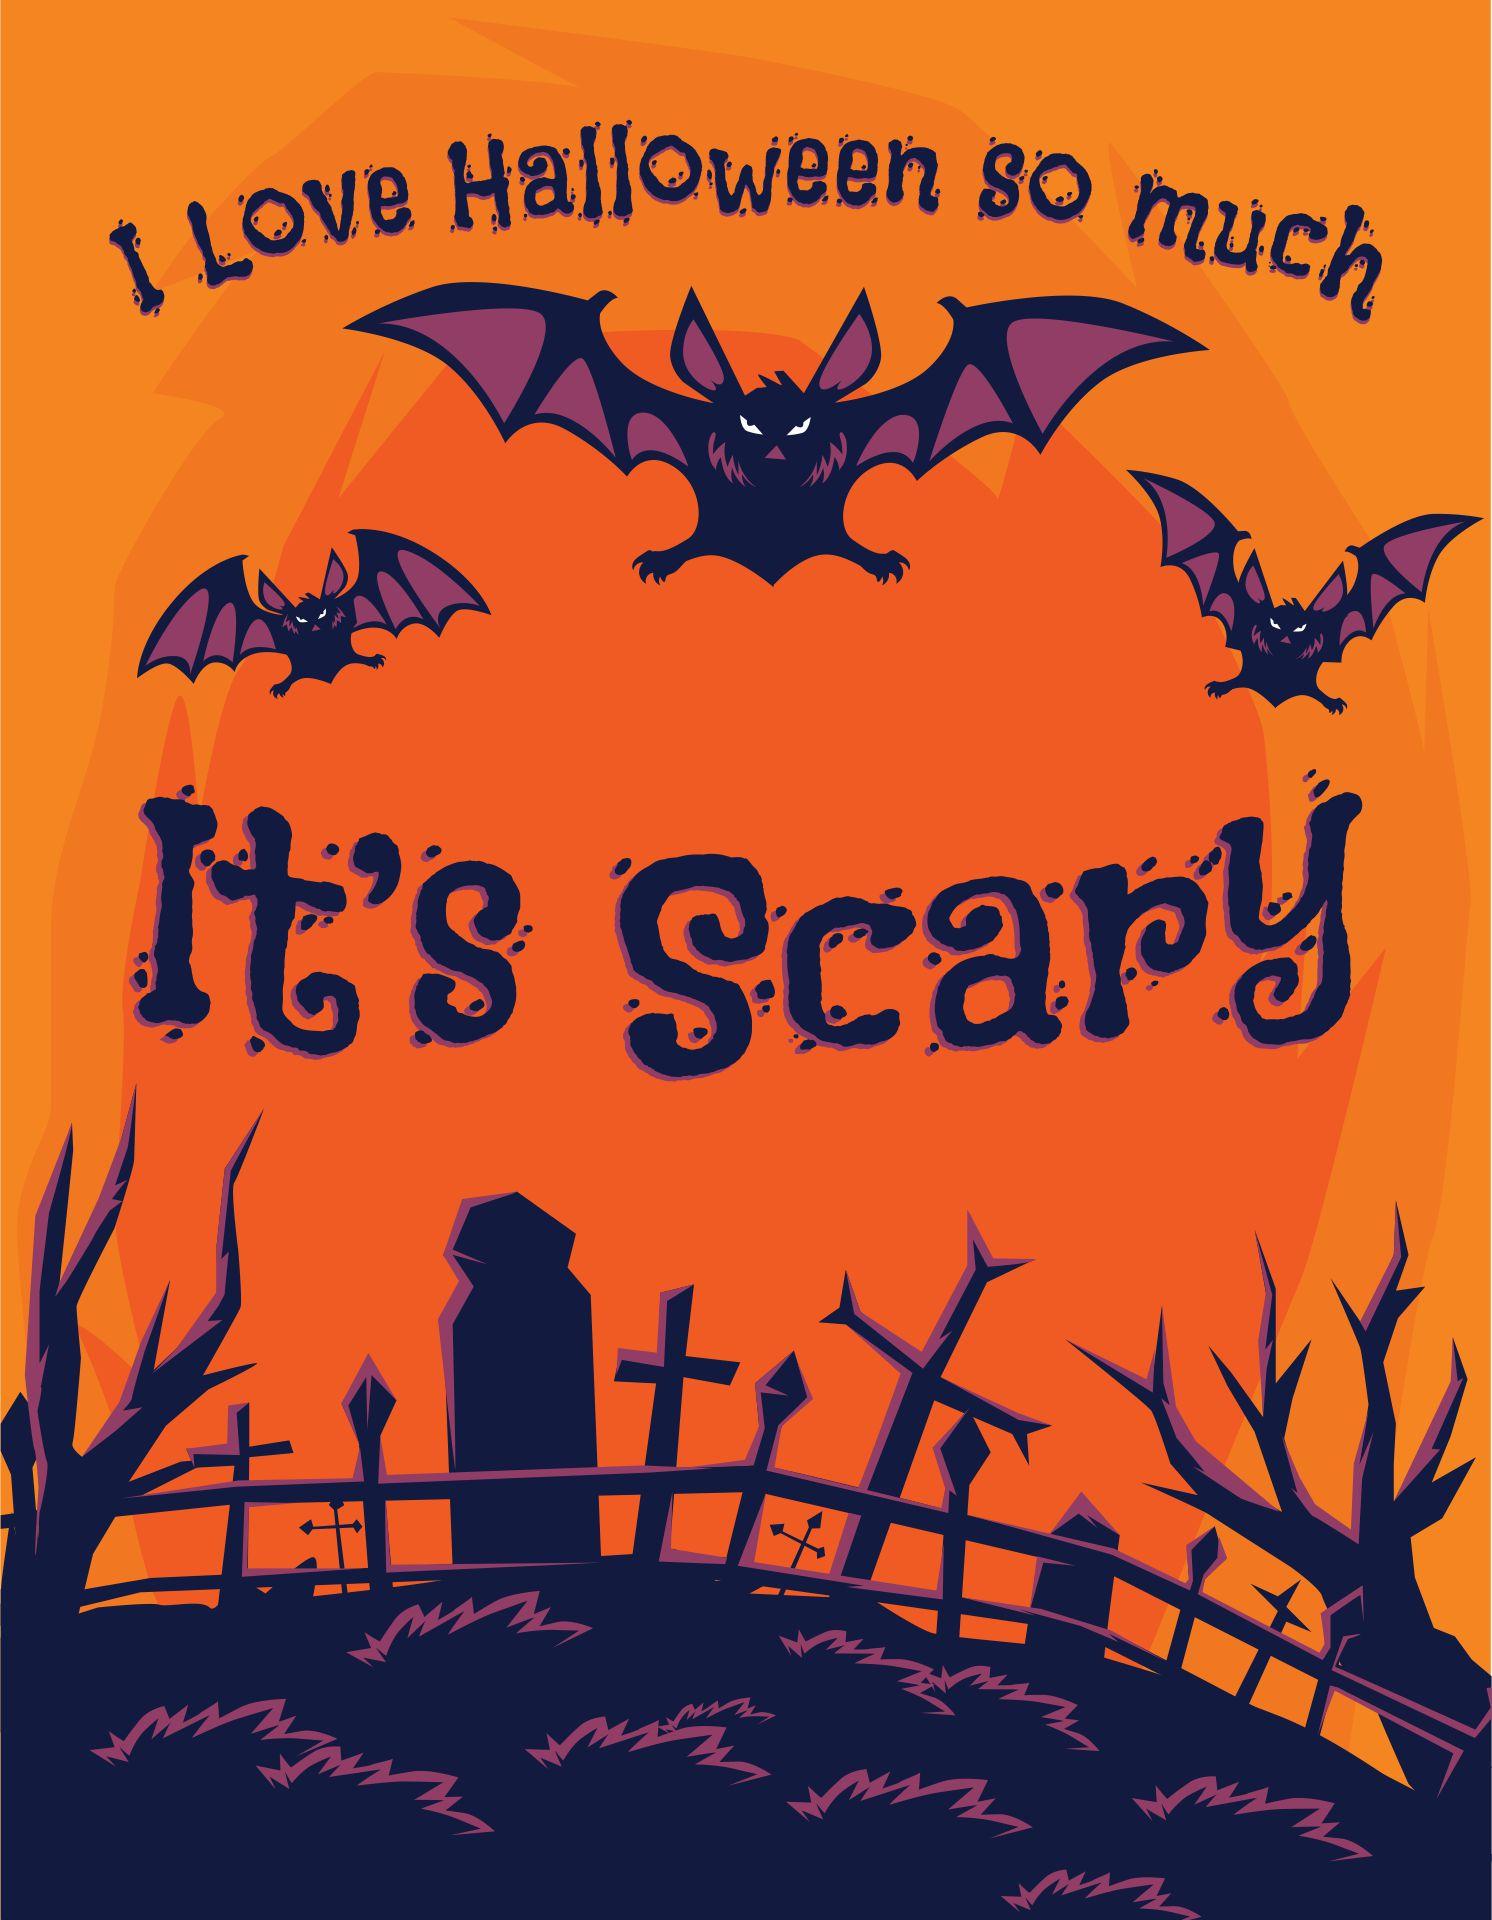 Scary Halloween Sayings For Signs Printable